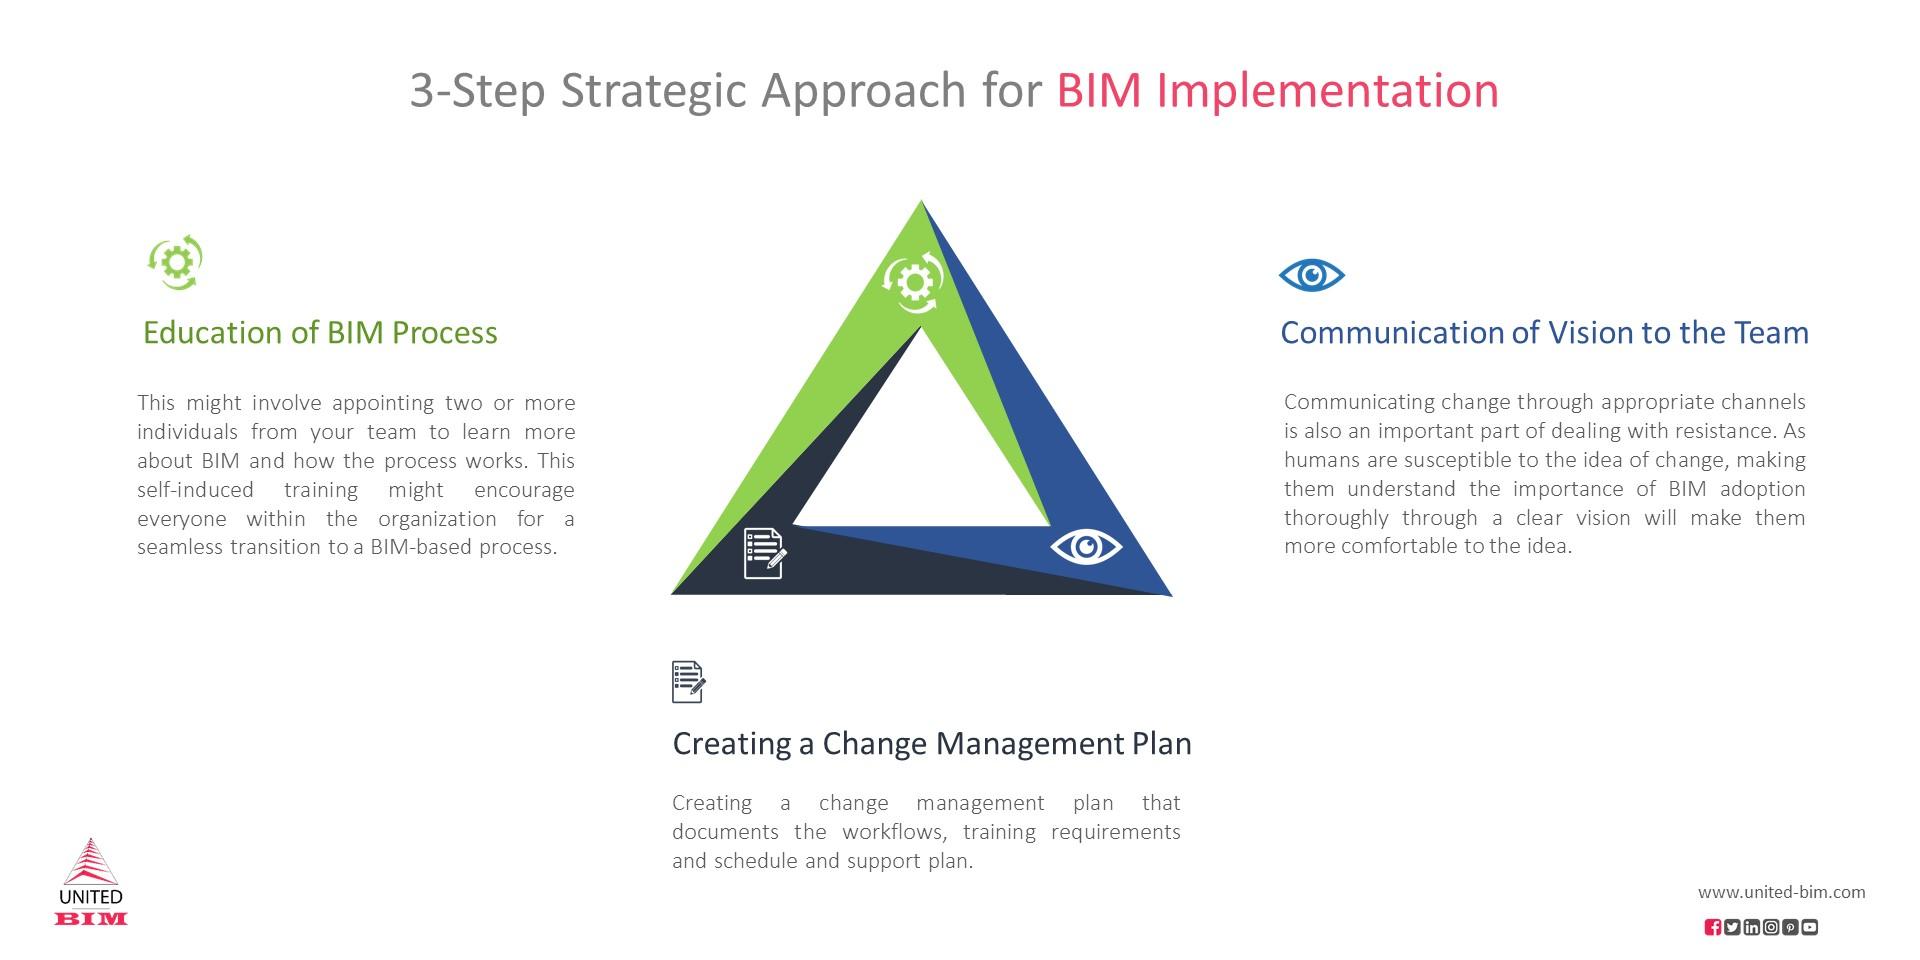 3-Step Strategic Approach for BIM Implementation by United-BIM